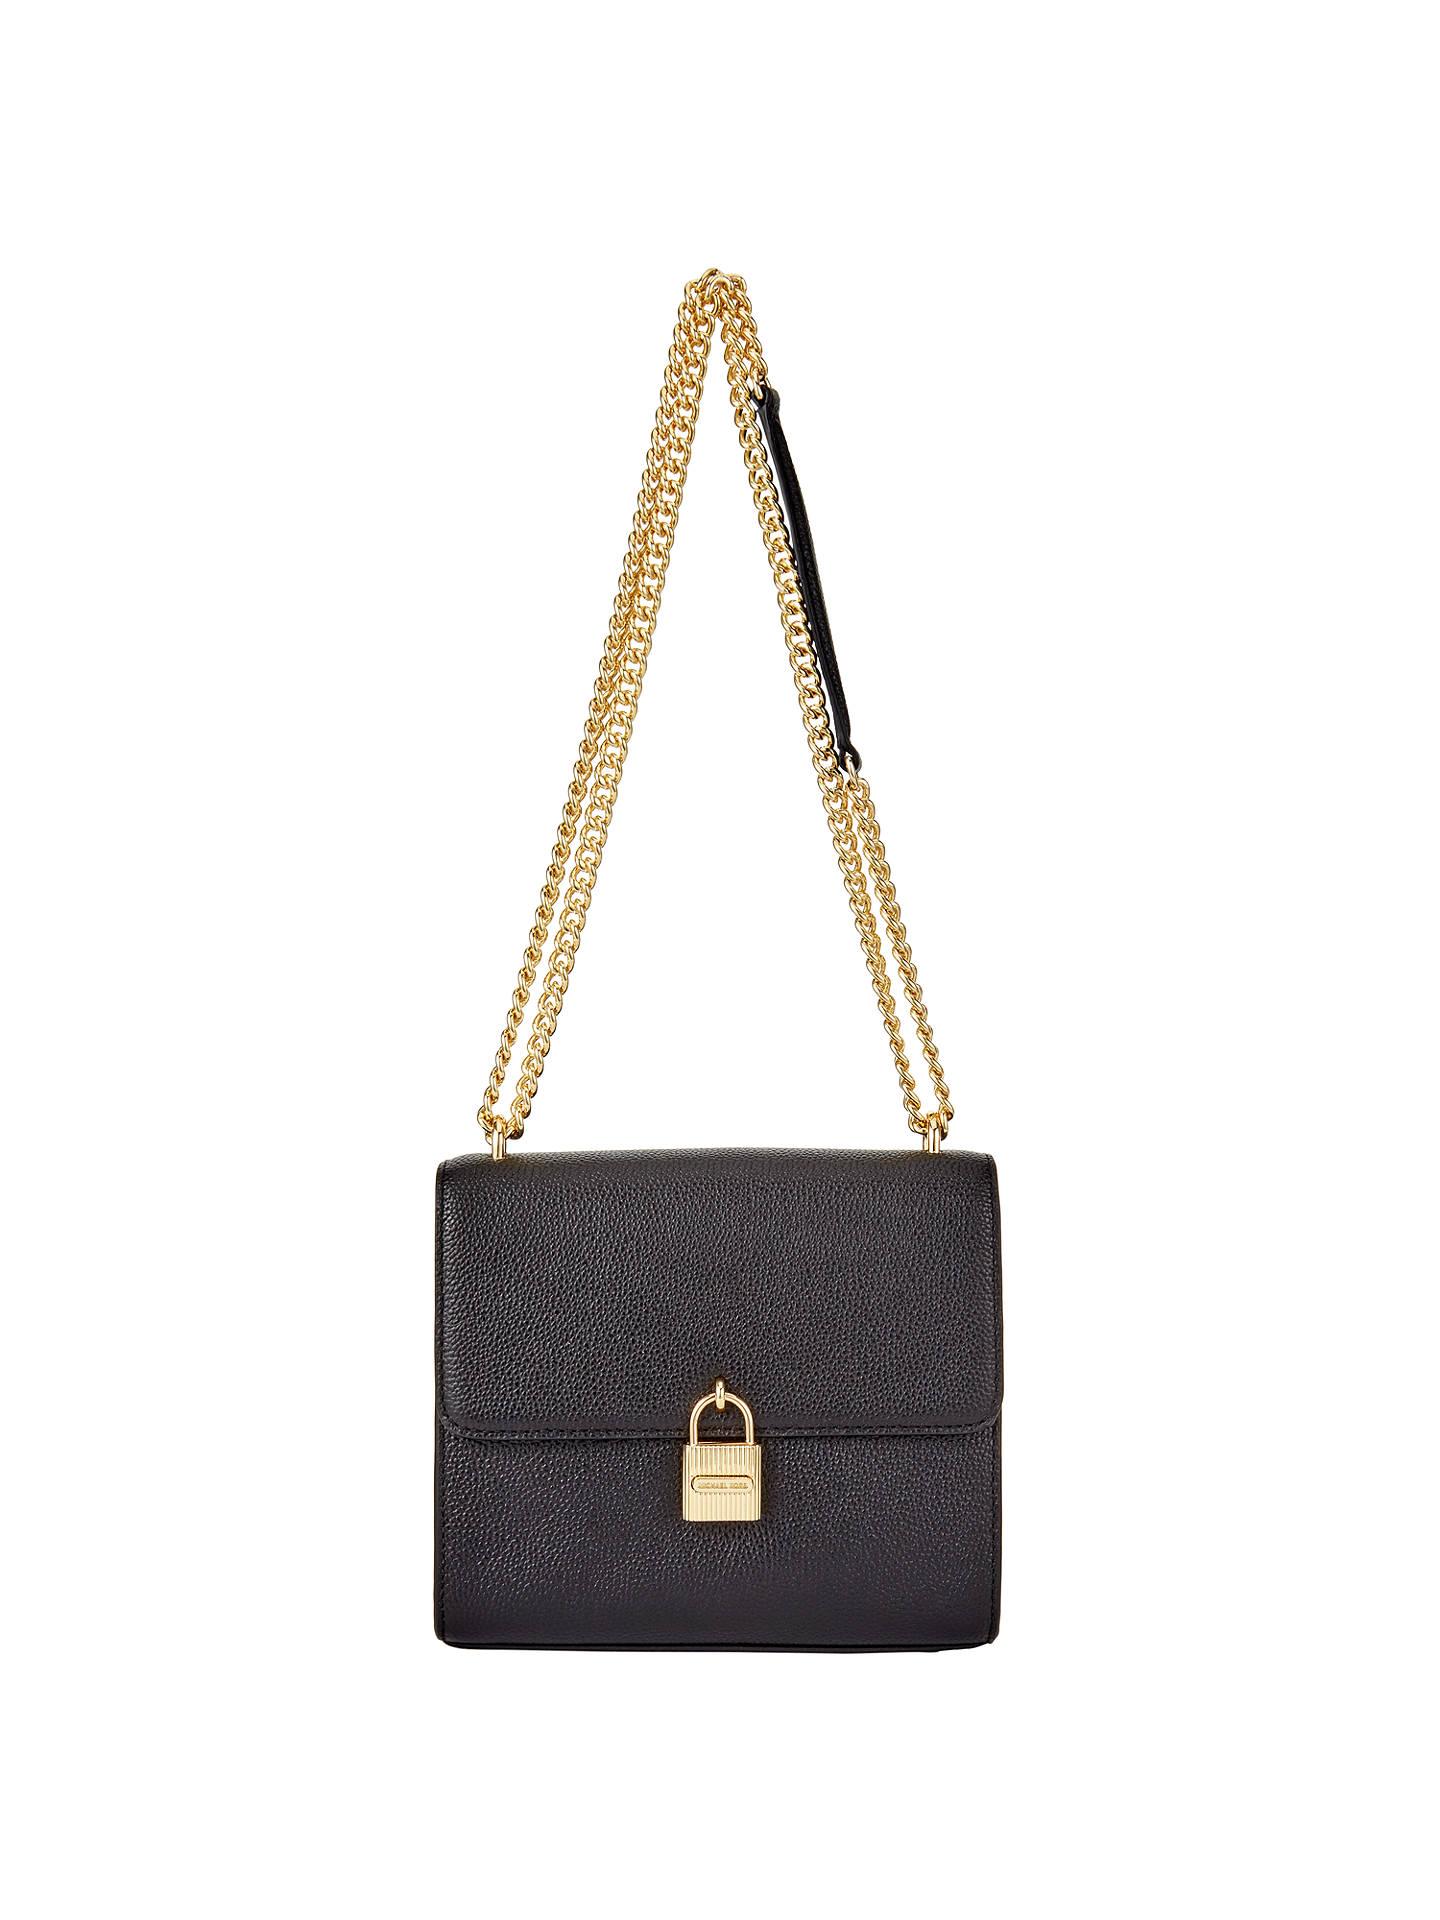 a434e3ed0749 Buy MICHAEL Michael Kors Mercer Large Leather Messenger Bag, Black Online  at johnlewis.com ...